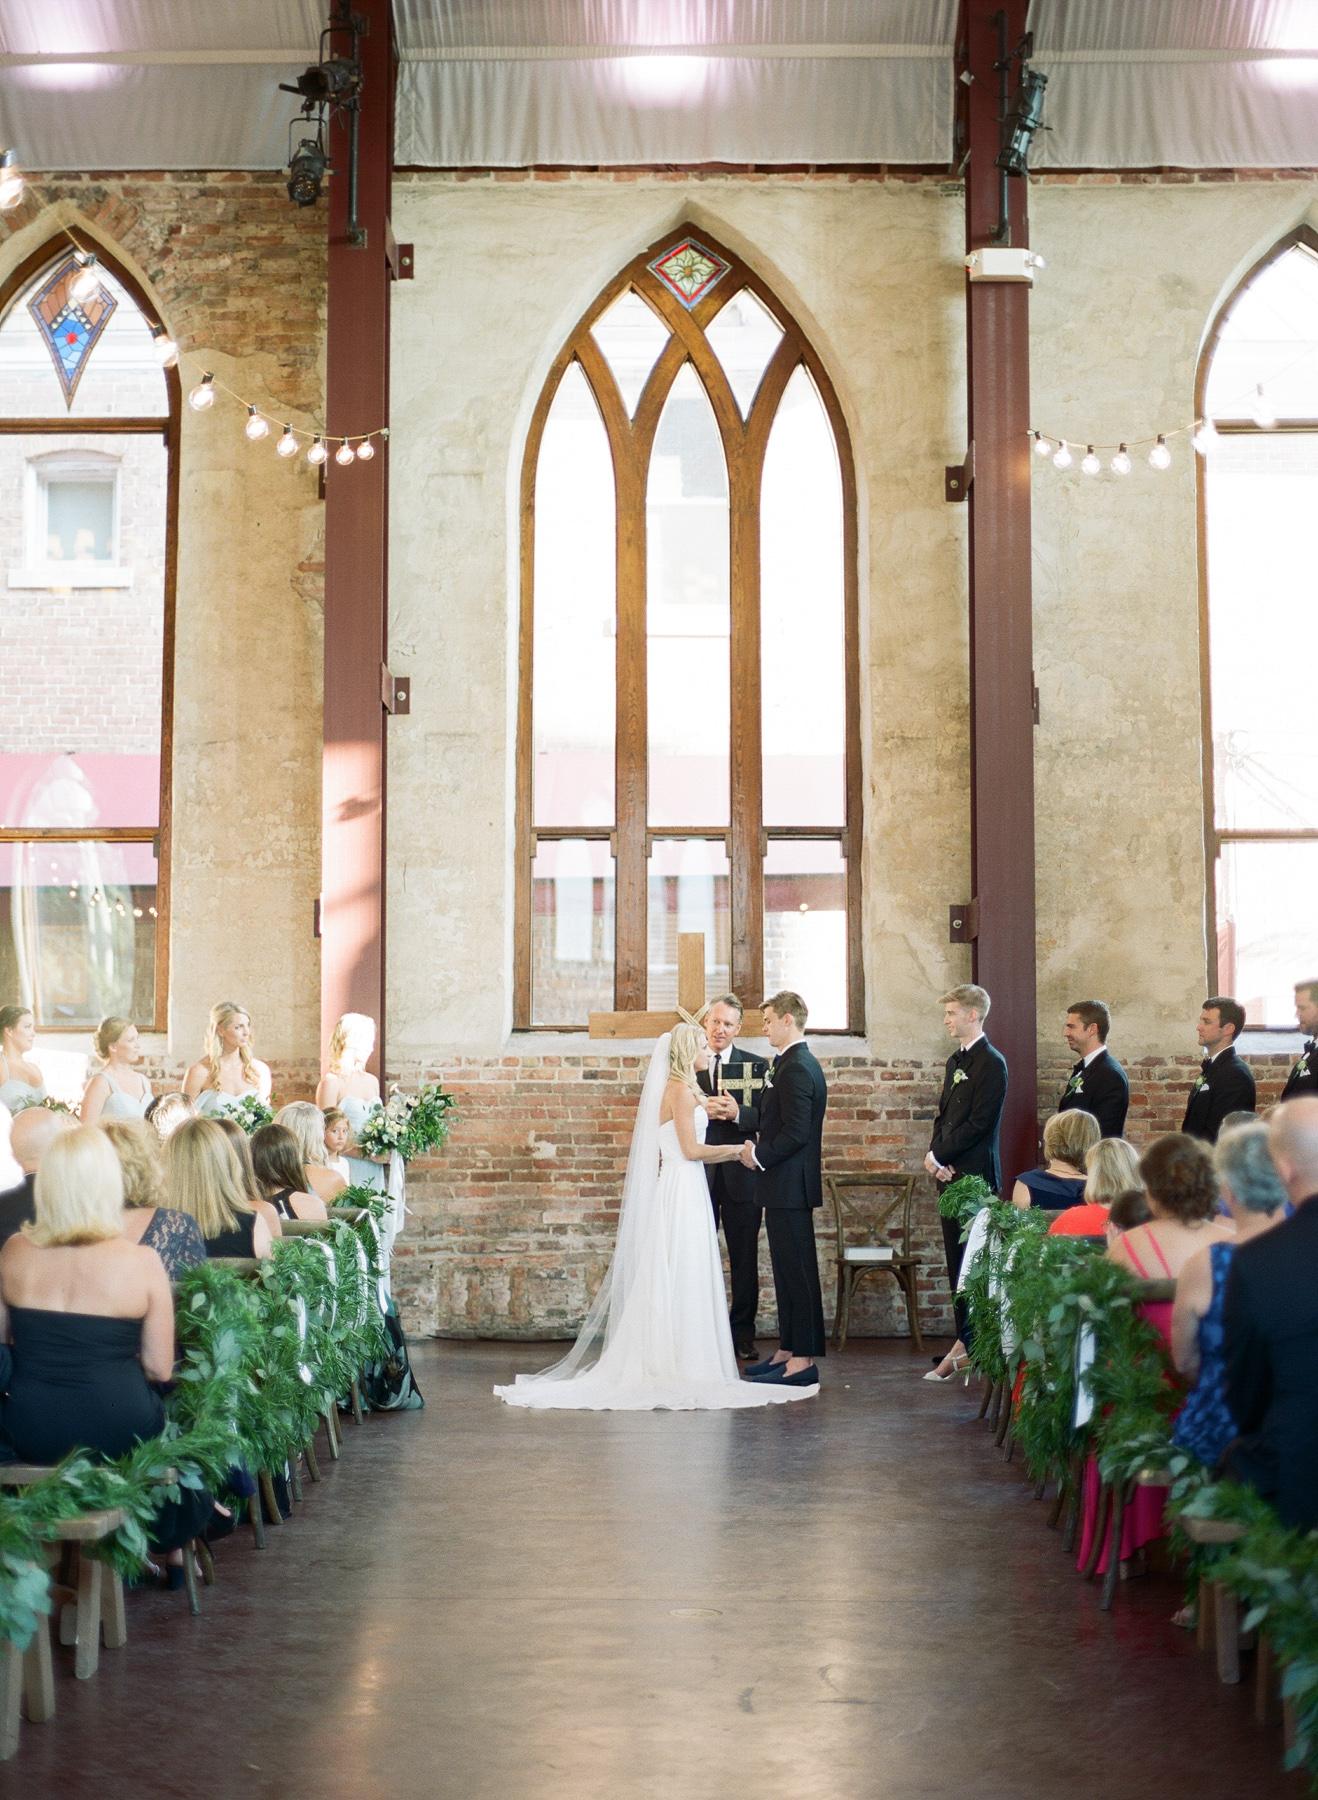 NC-wedding-venues-film-photographer-24.jpg